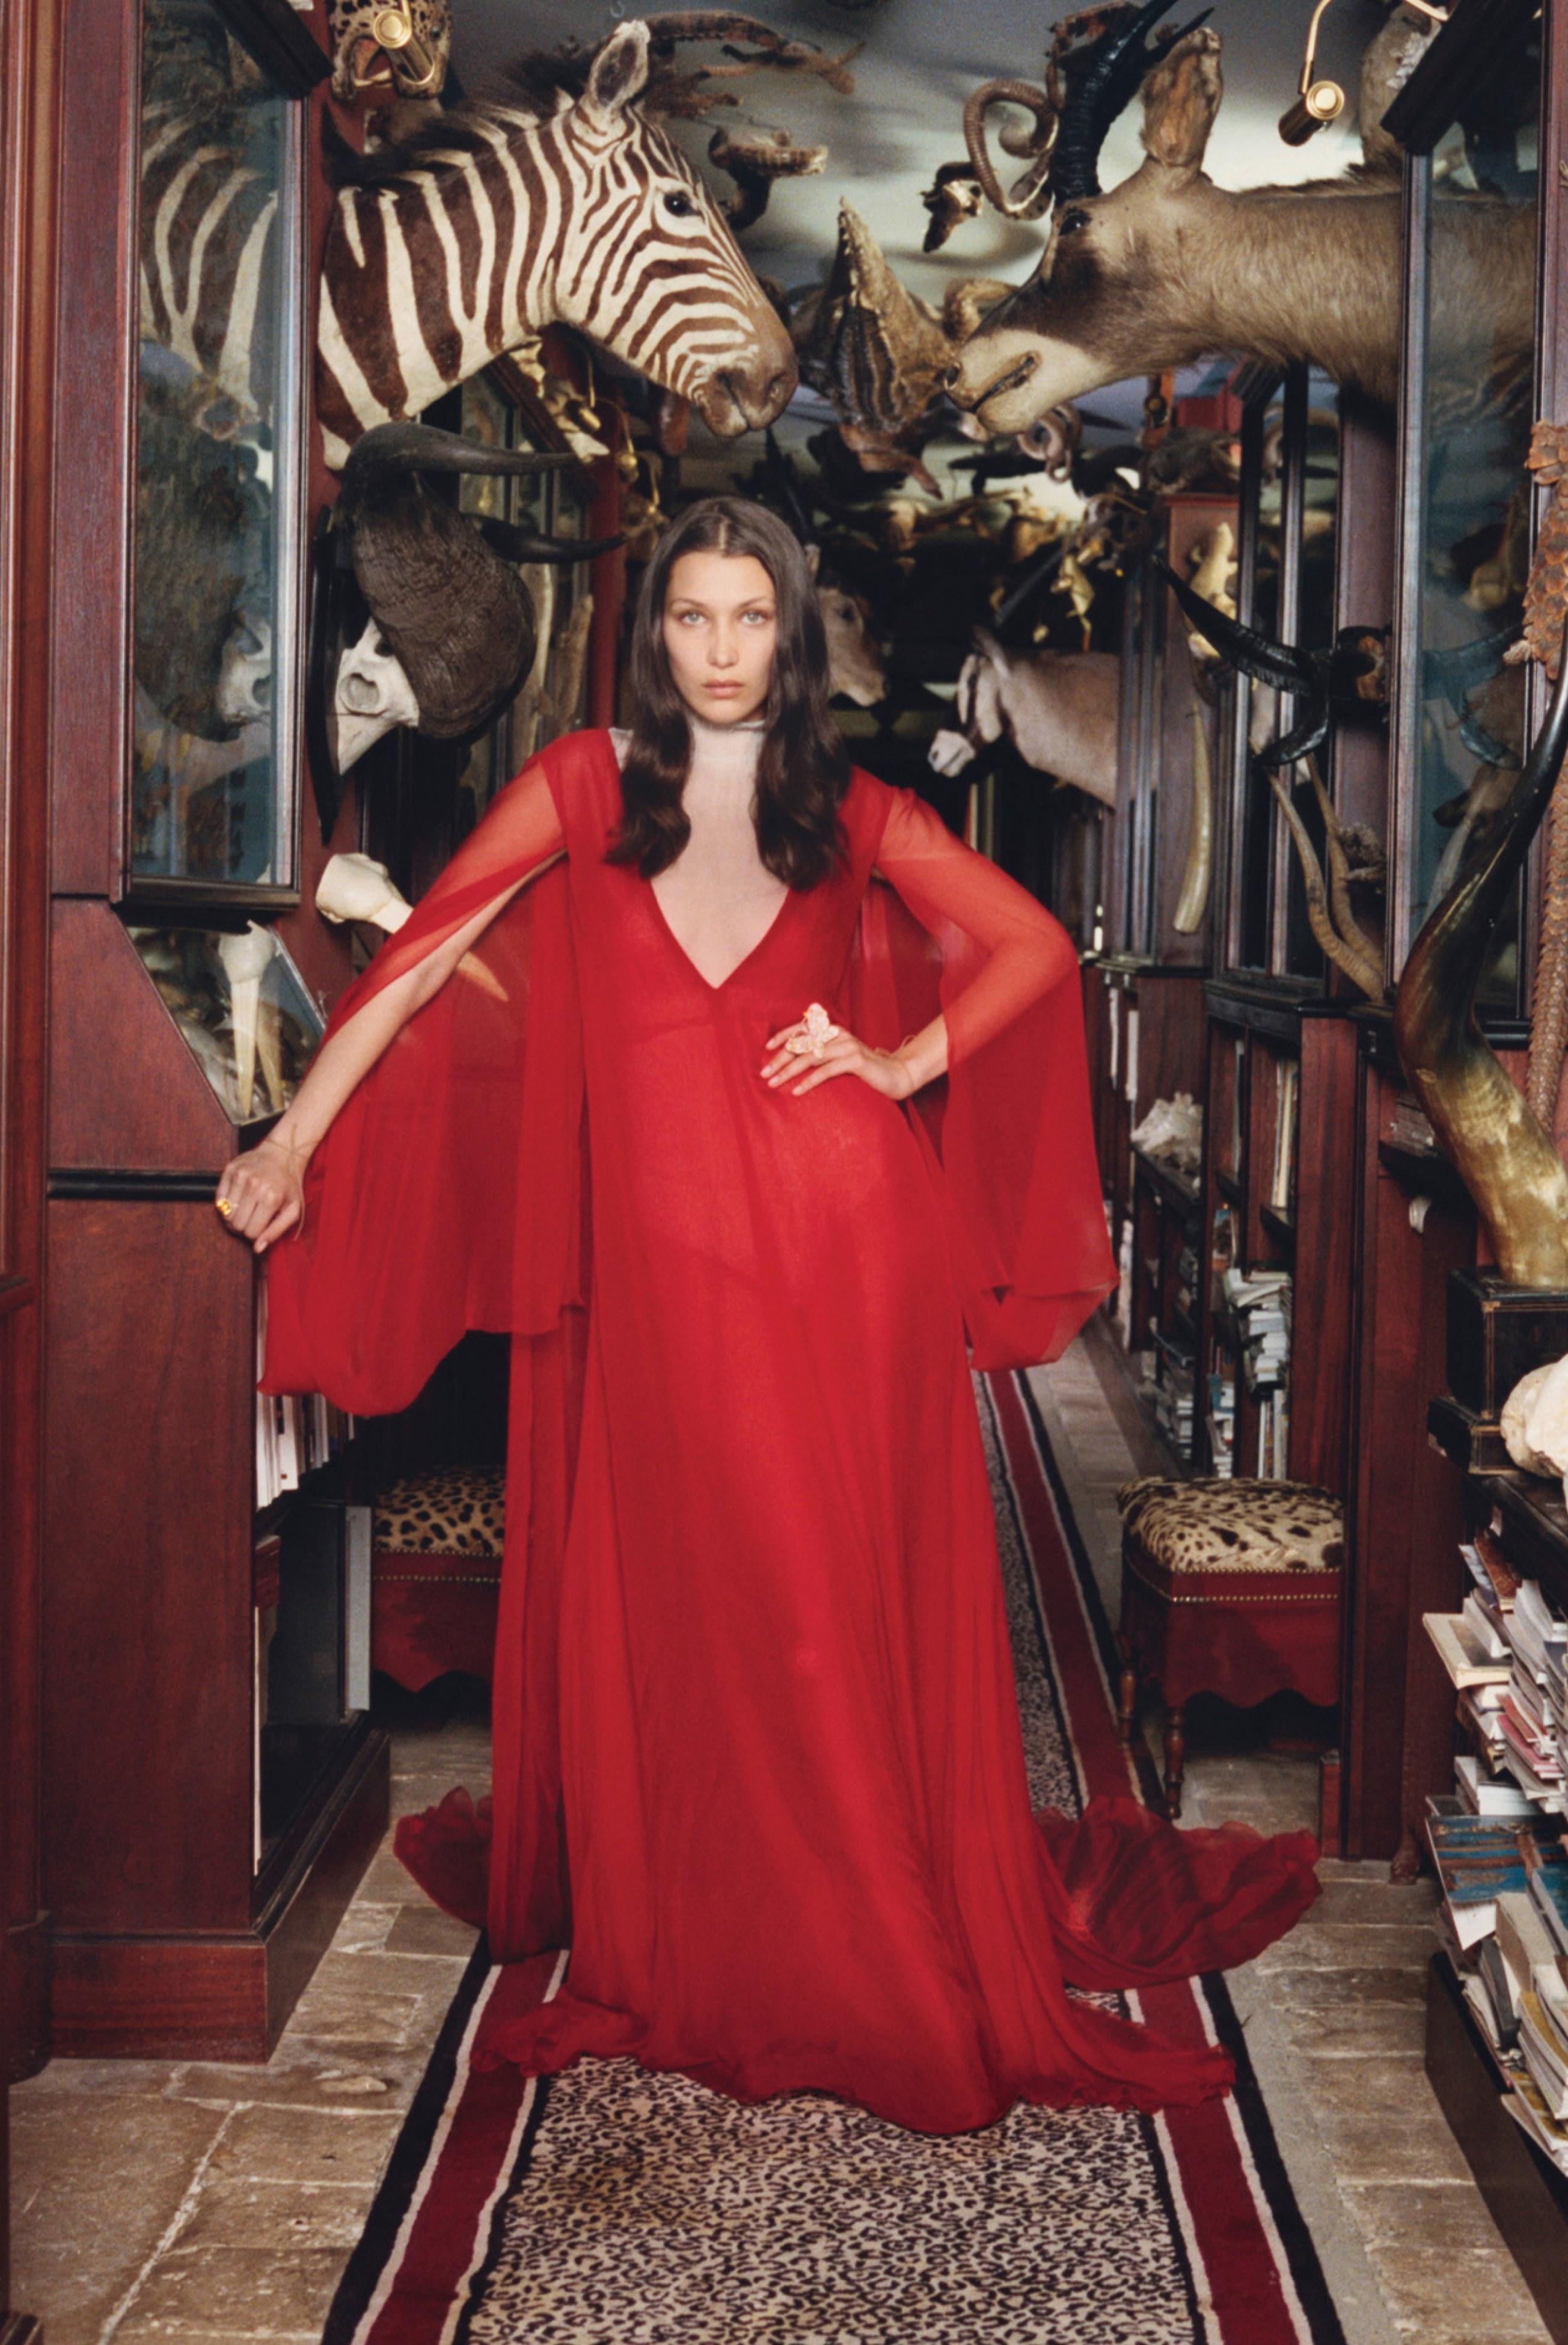 @pfairytale Bella Hadid for W Magazine